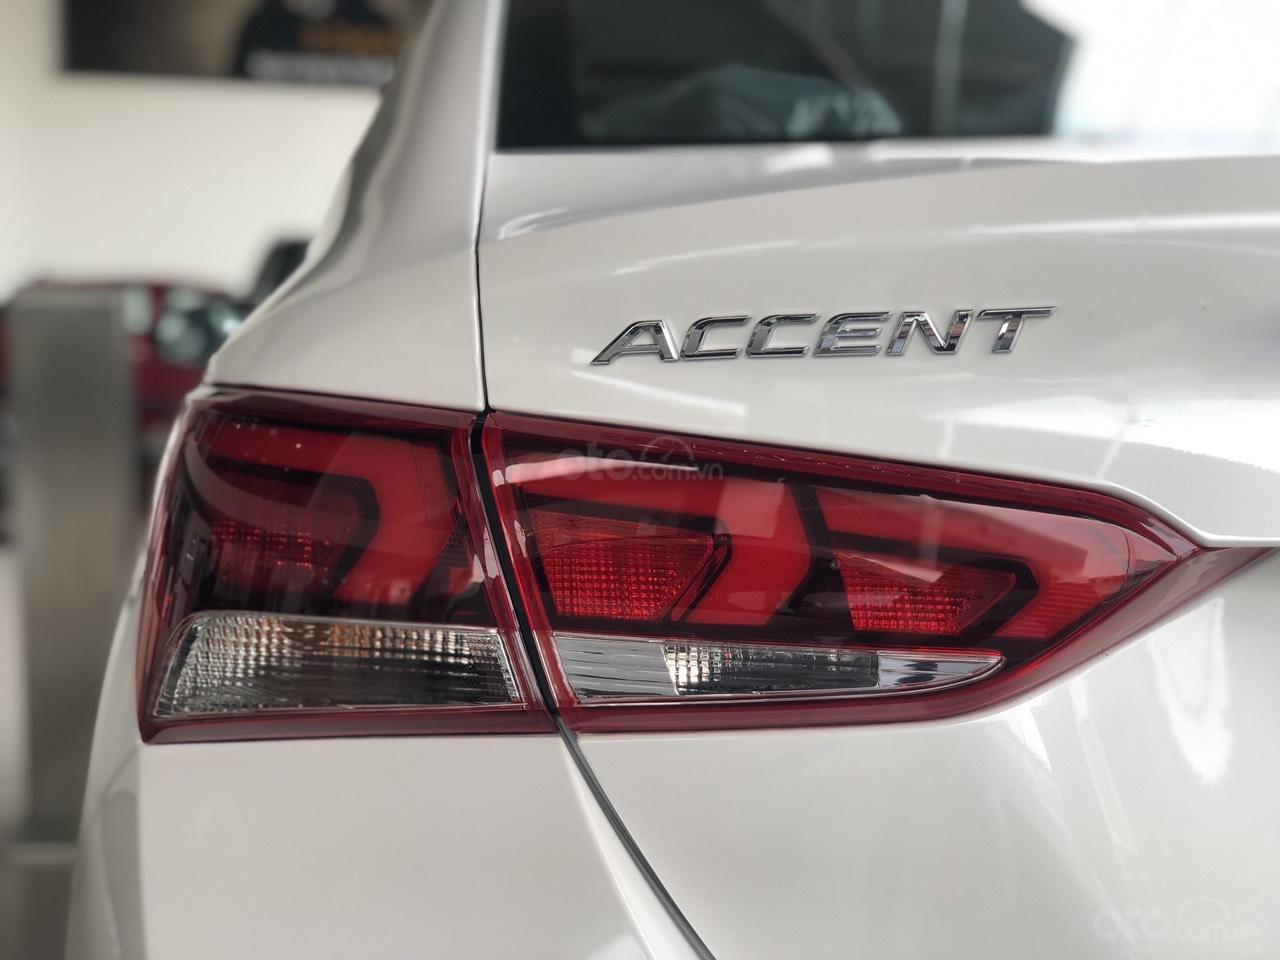 Bán Hyundai Accent 2019 - Giá tốt - xe sẵn - Bank bao đậu (5)